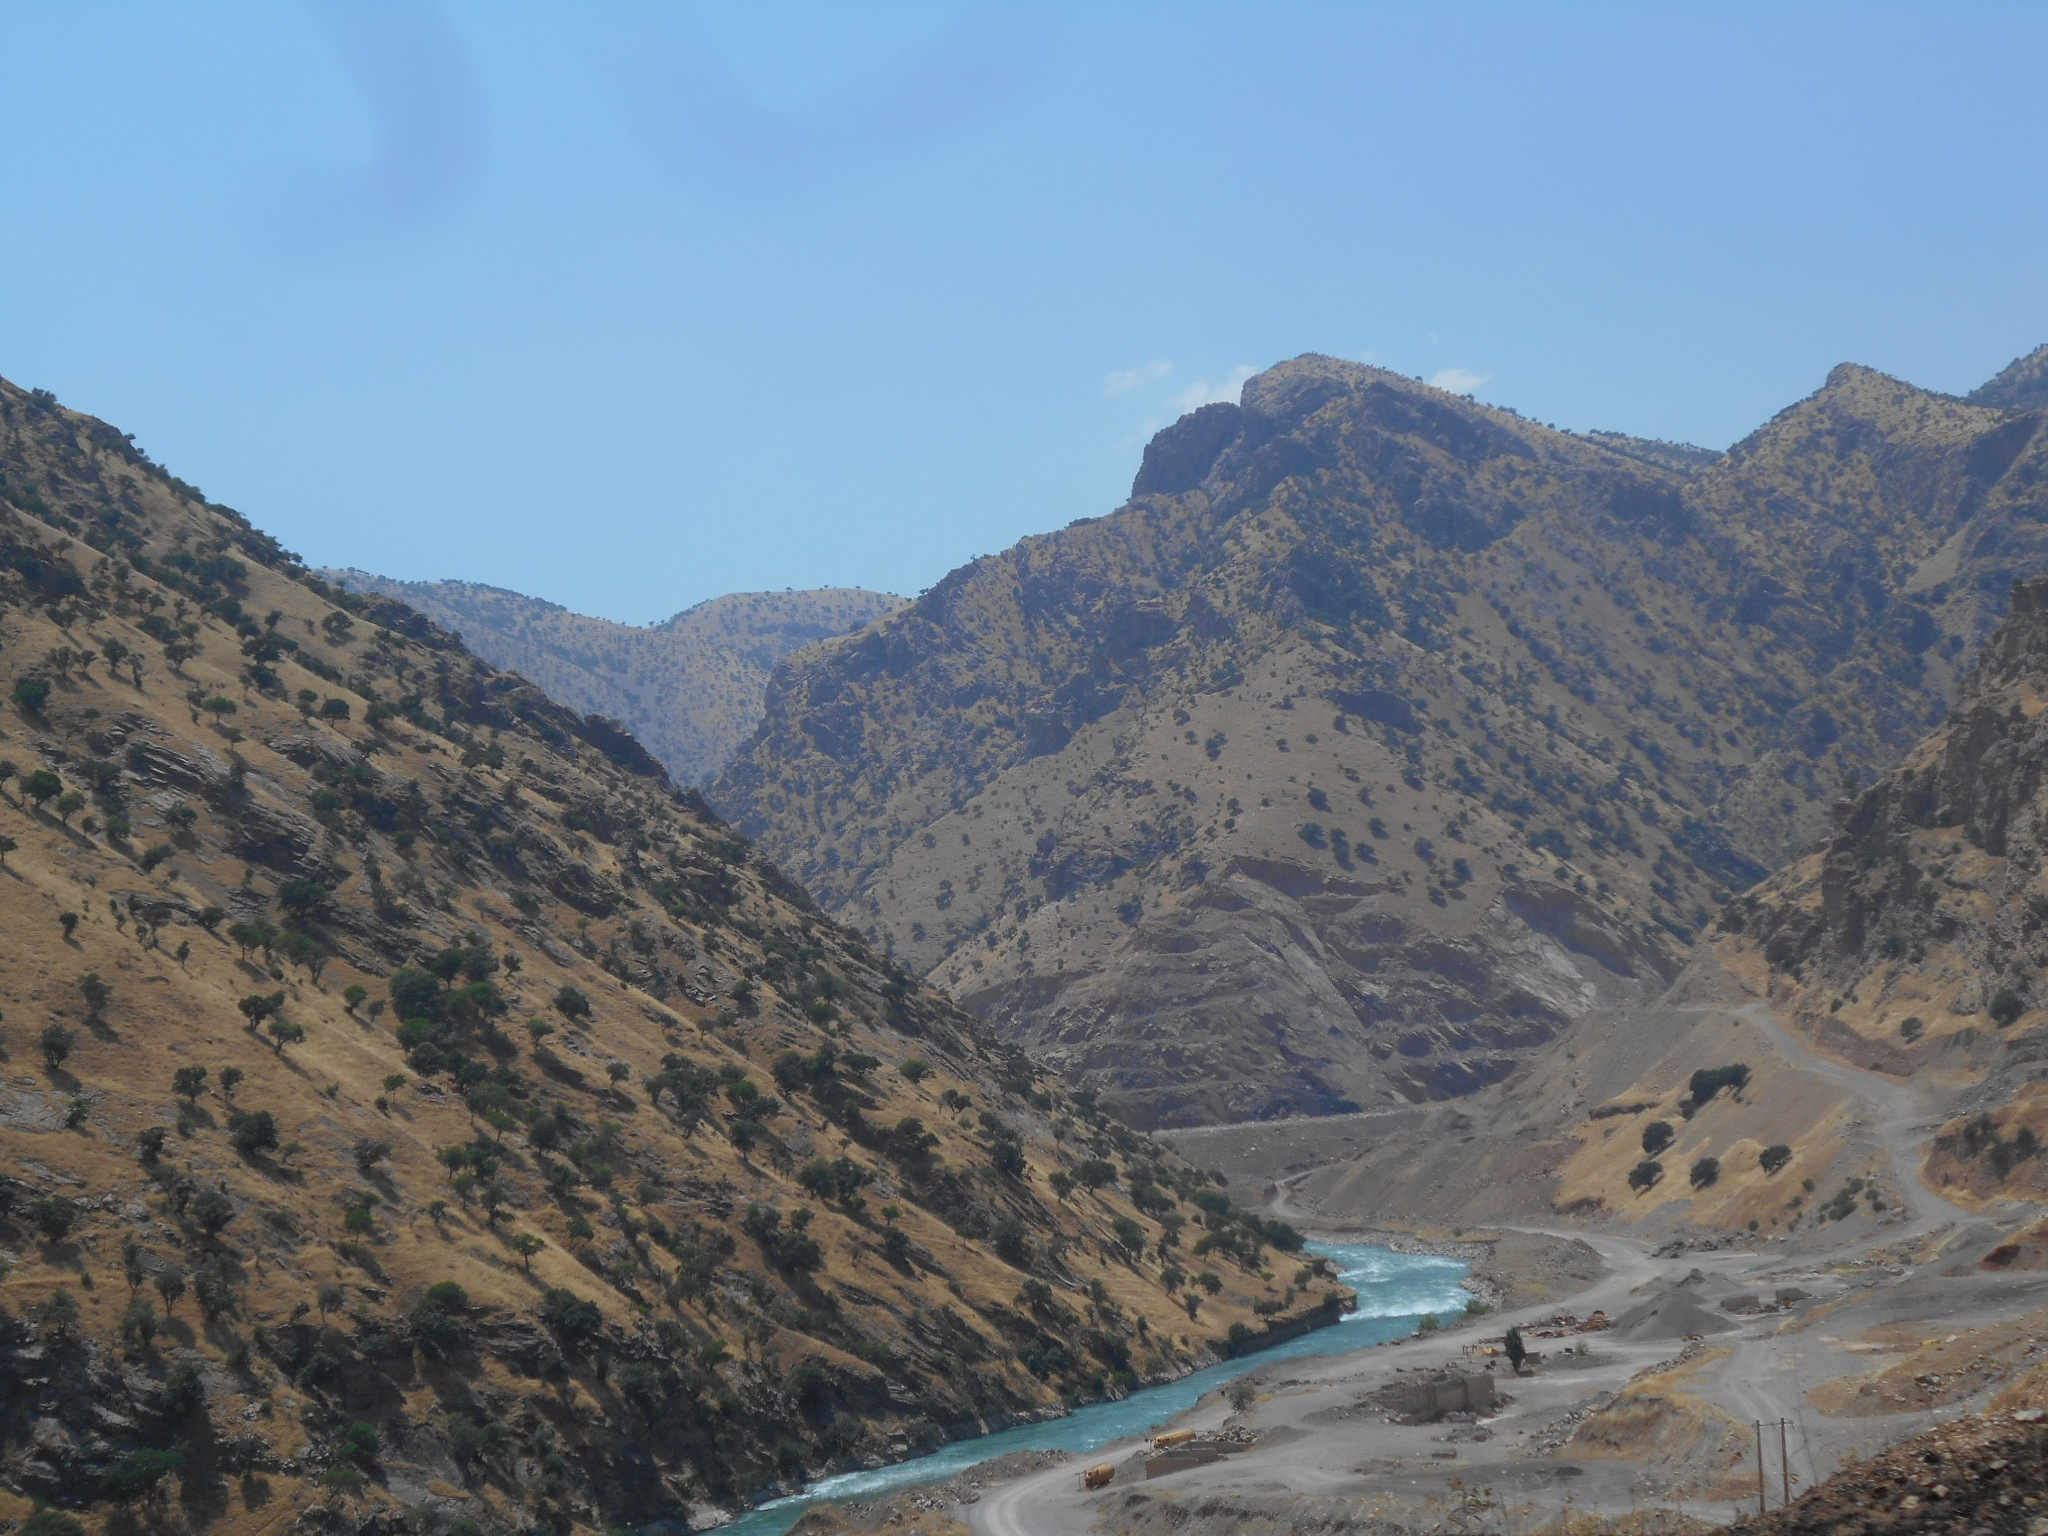 The river through  vally            by Reza karimi